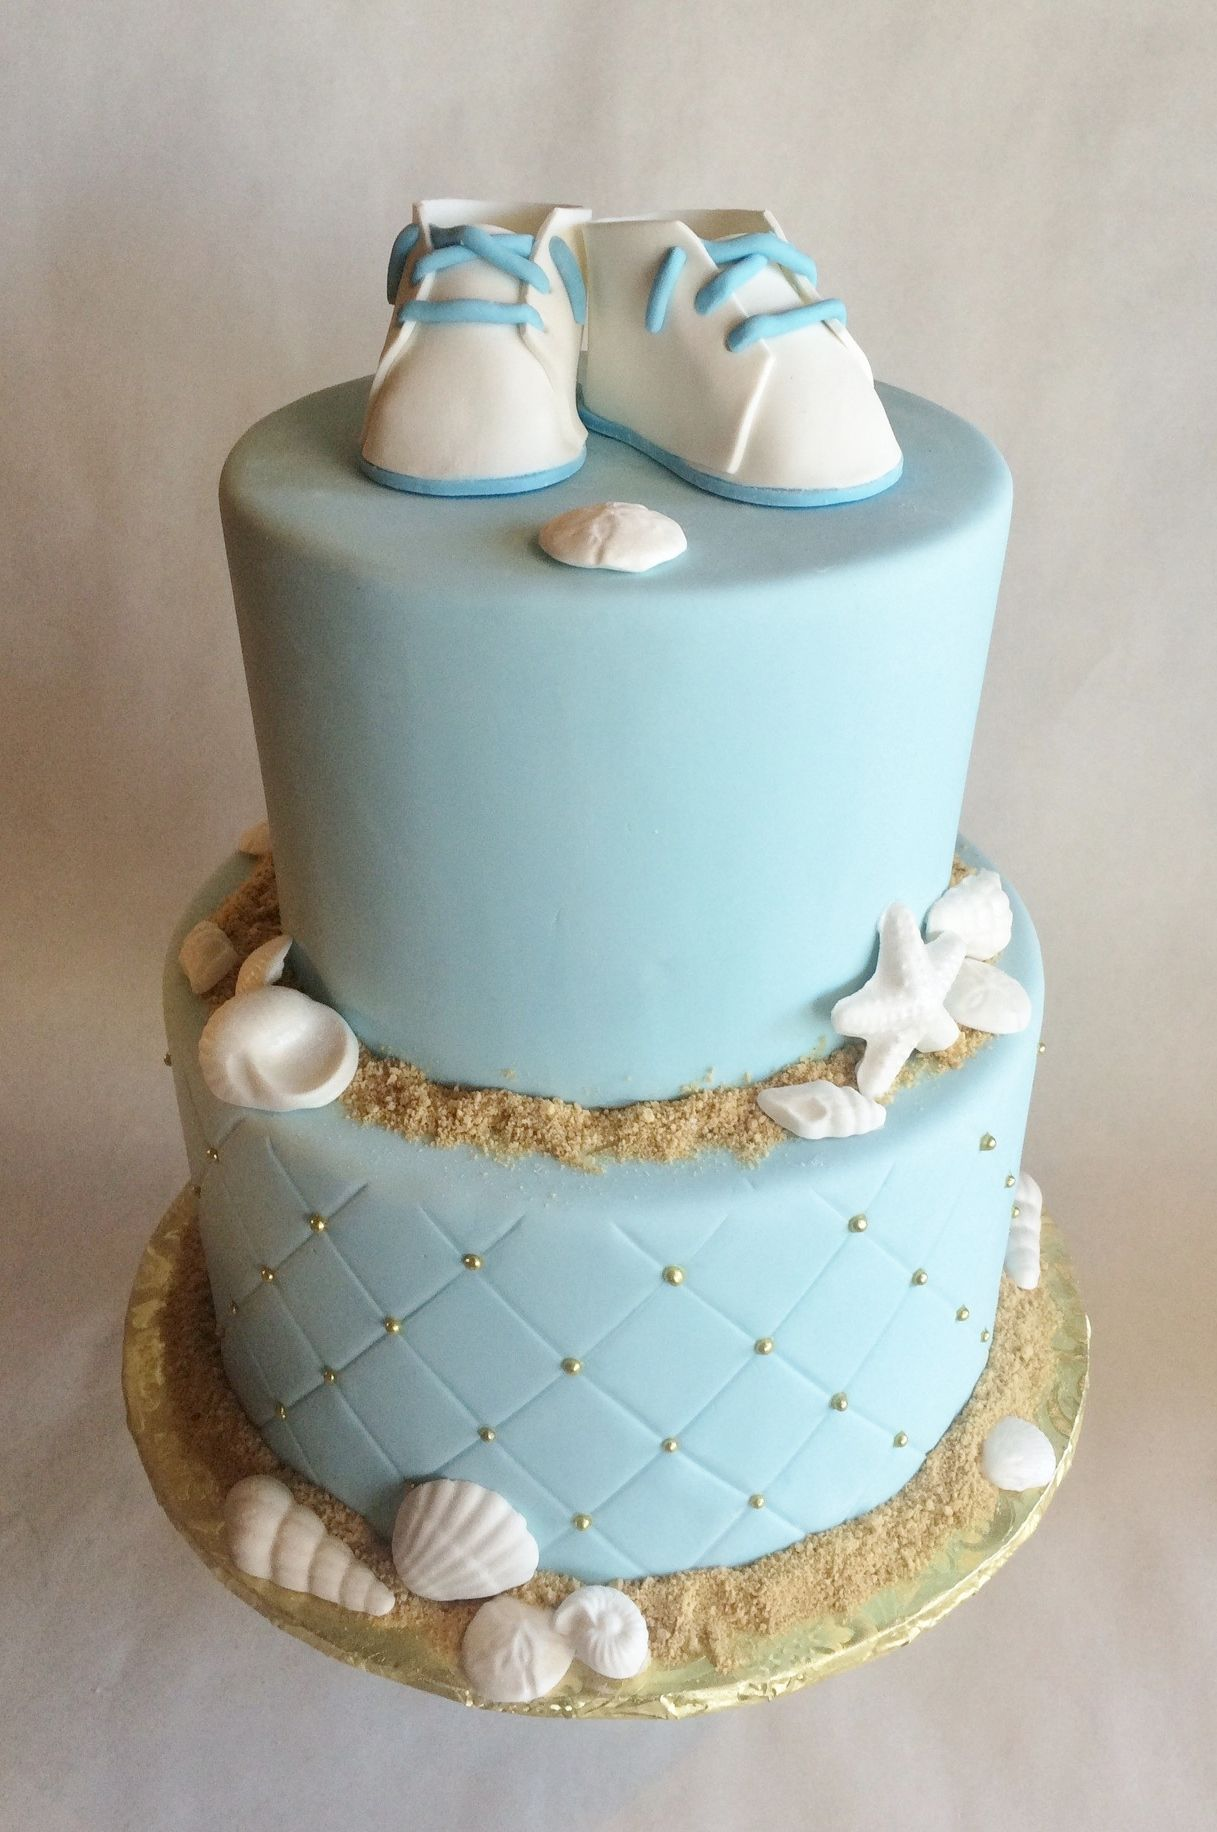 Baby Shower Cake - Ocean - Beach - Baby Shoes